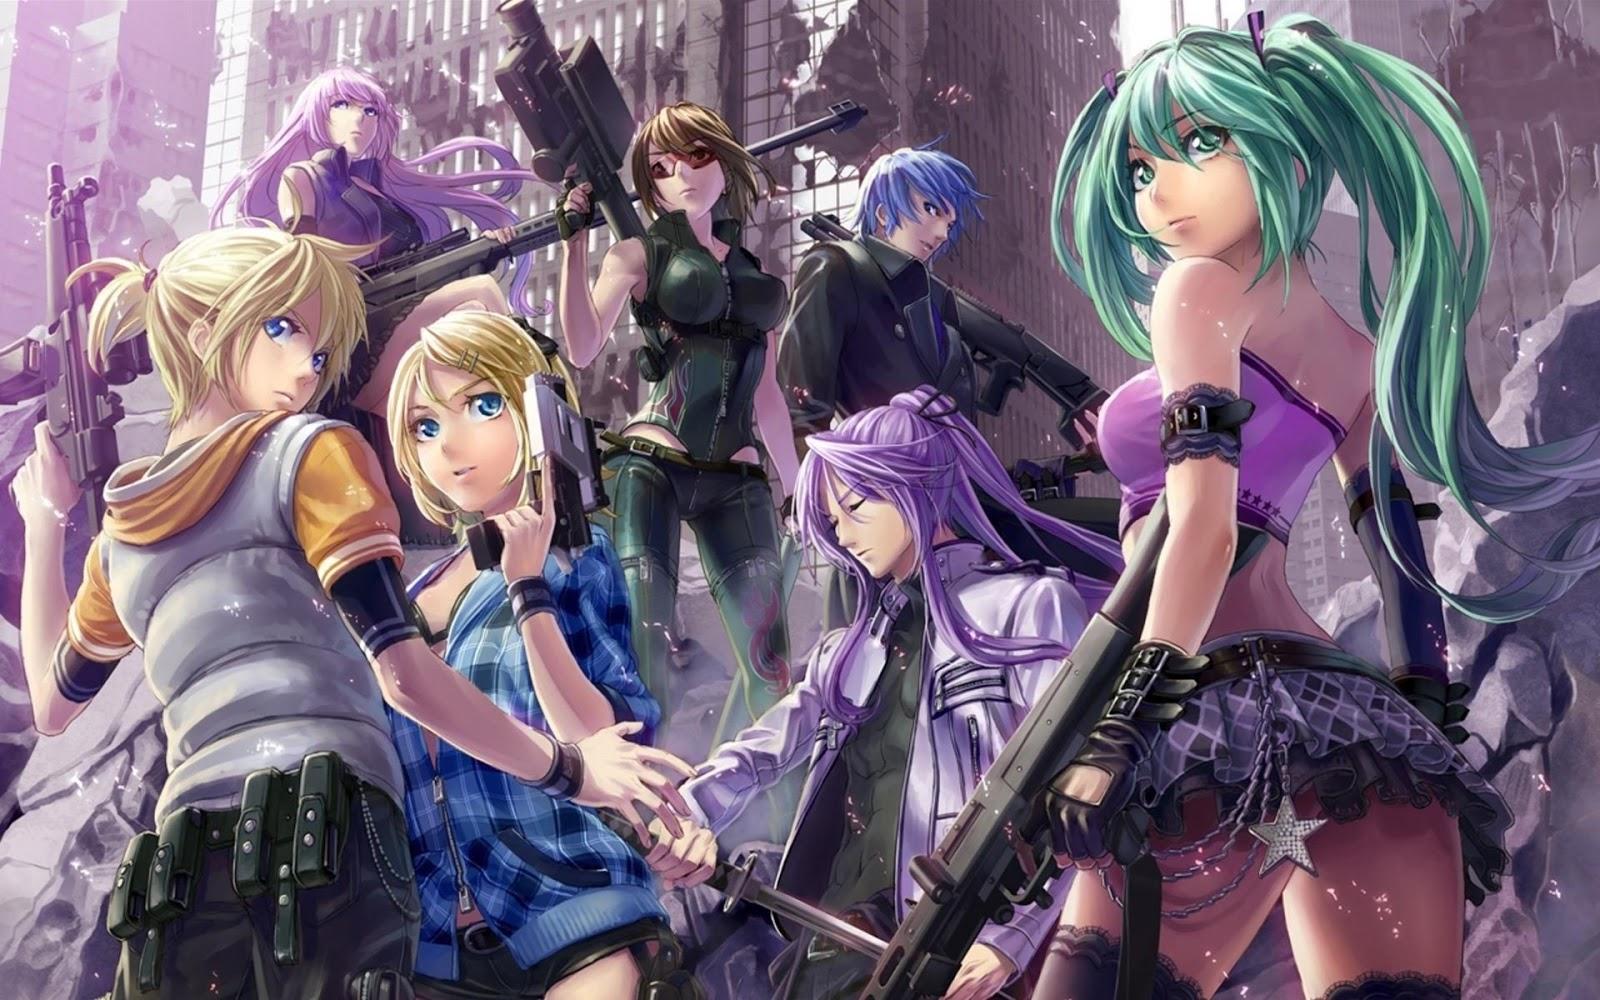 Anime Girl Characters Full HD Desktop Wallpapers 1080p 1600x1000